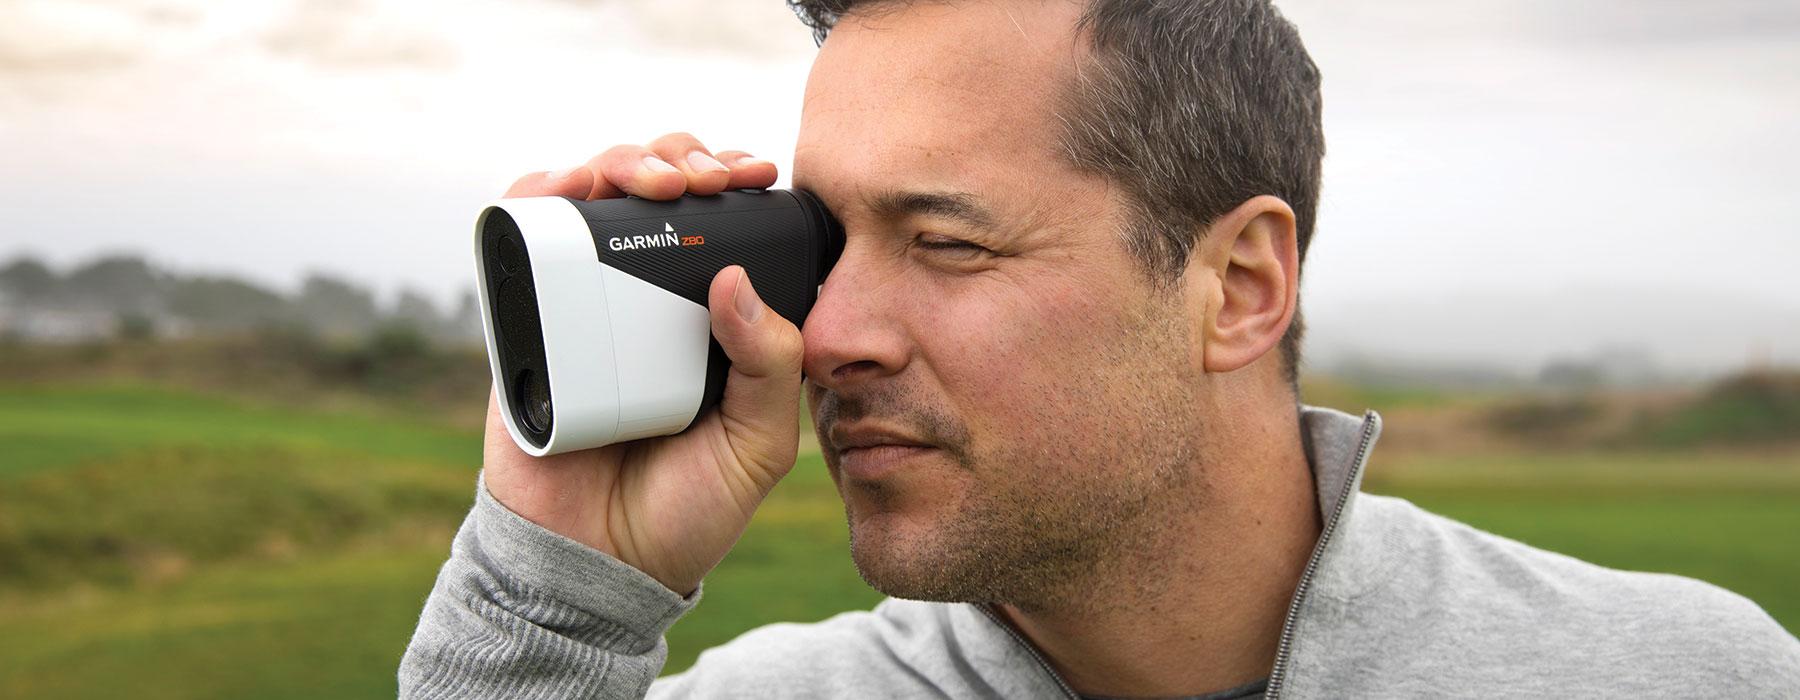 Golf Science - A man using the Garmin Laser Range Finder